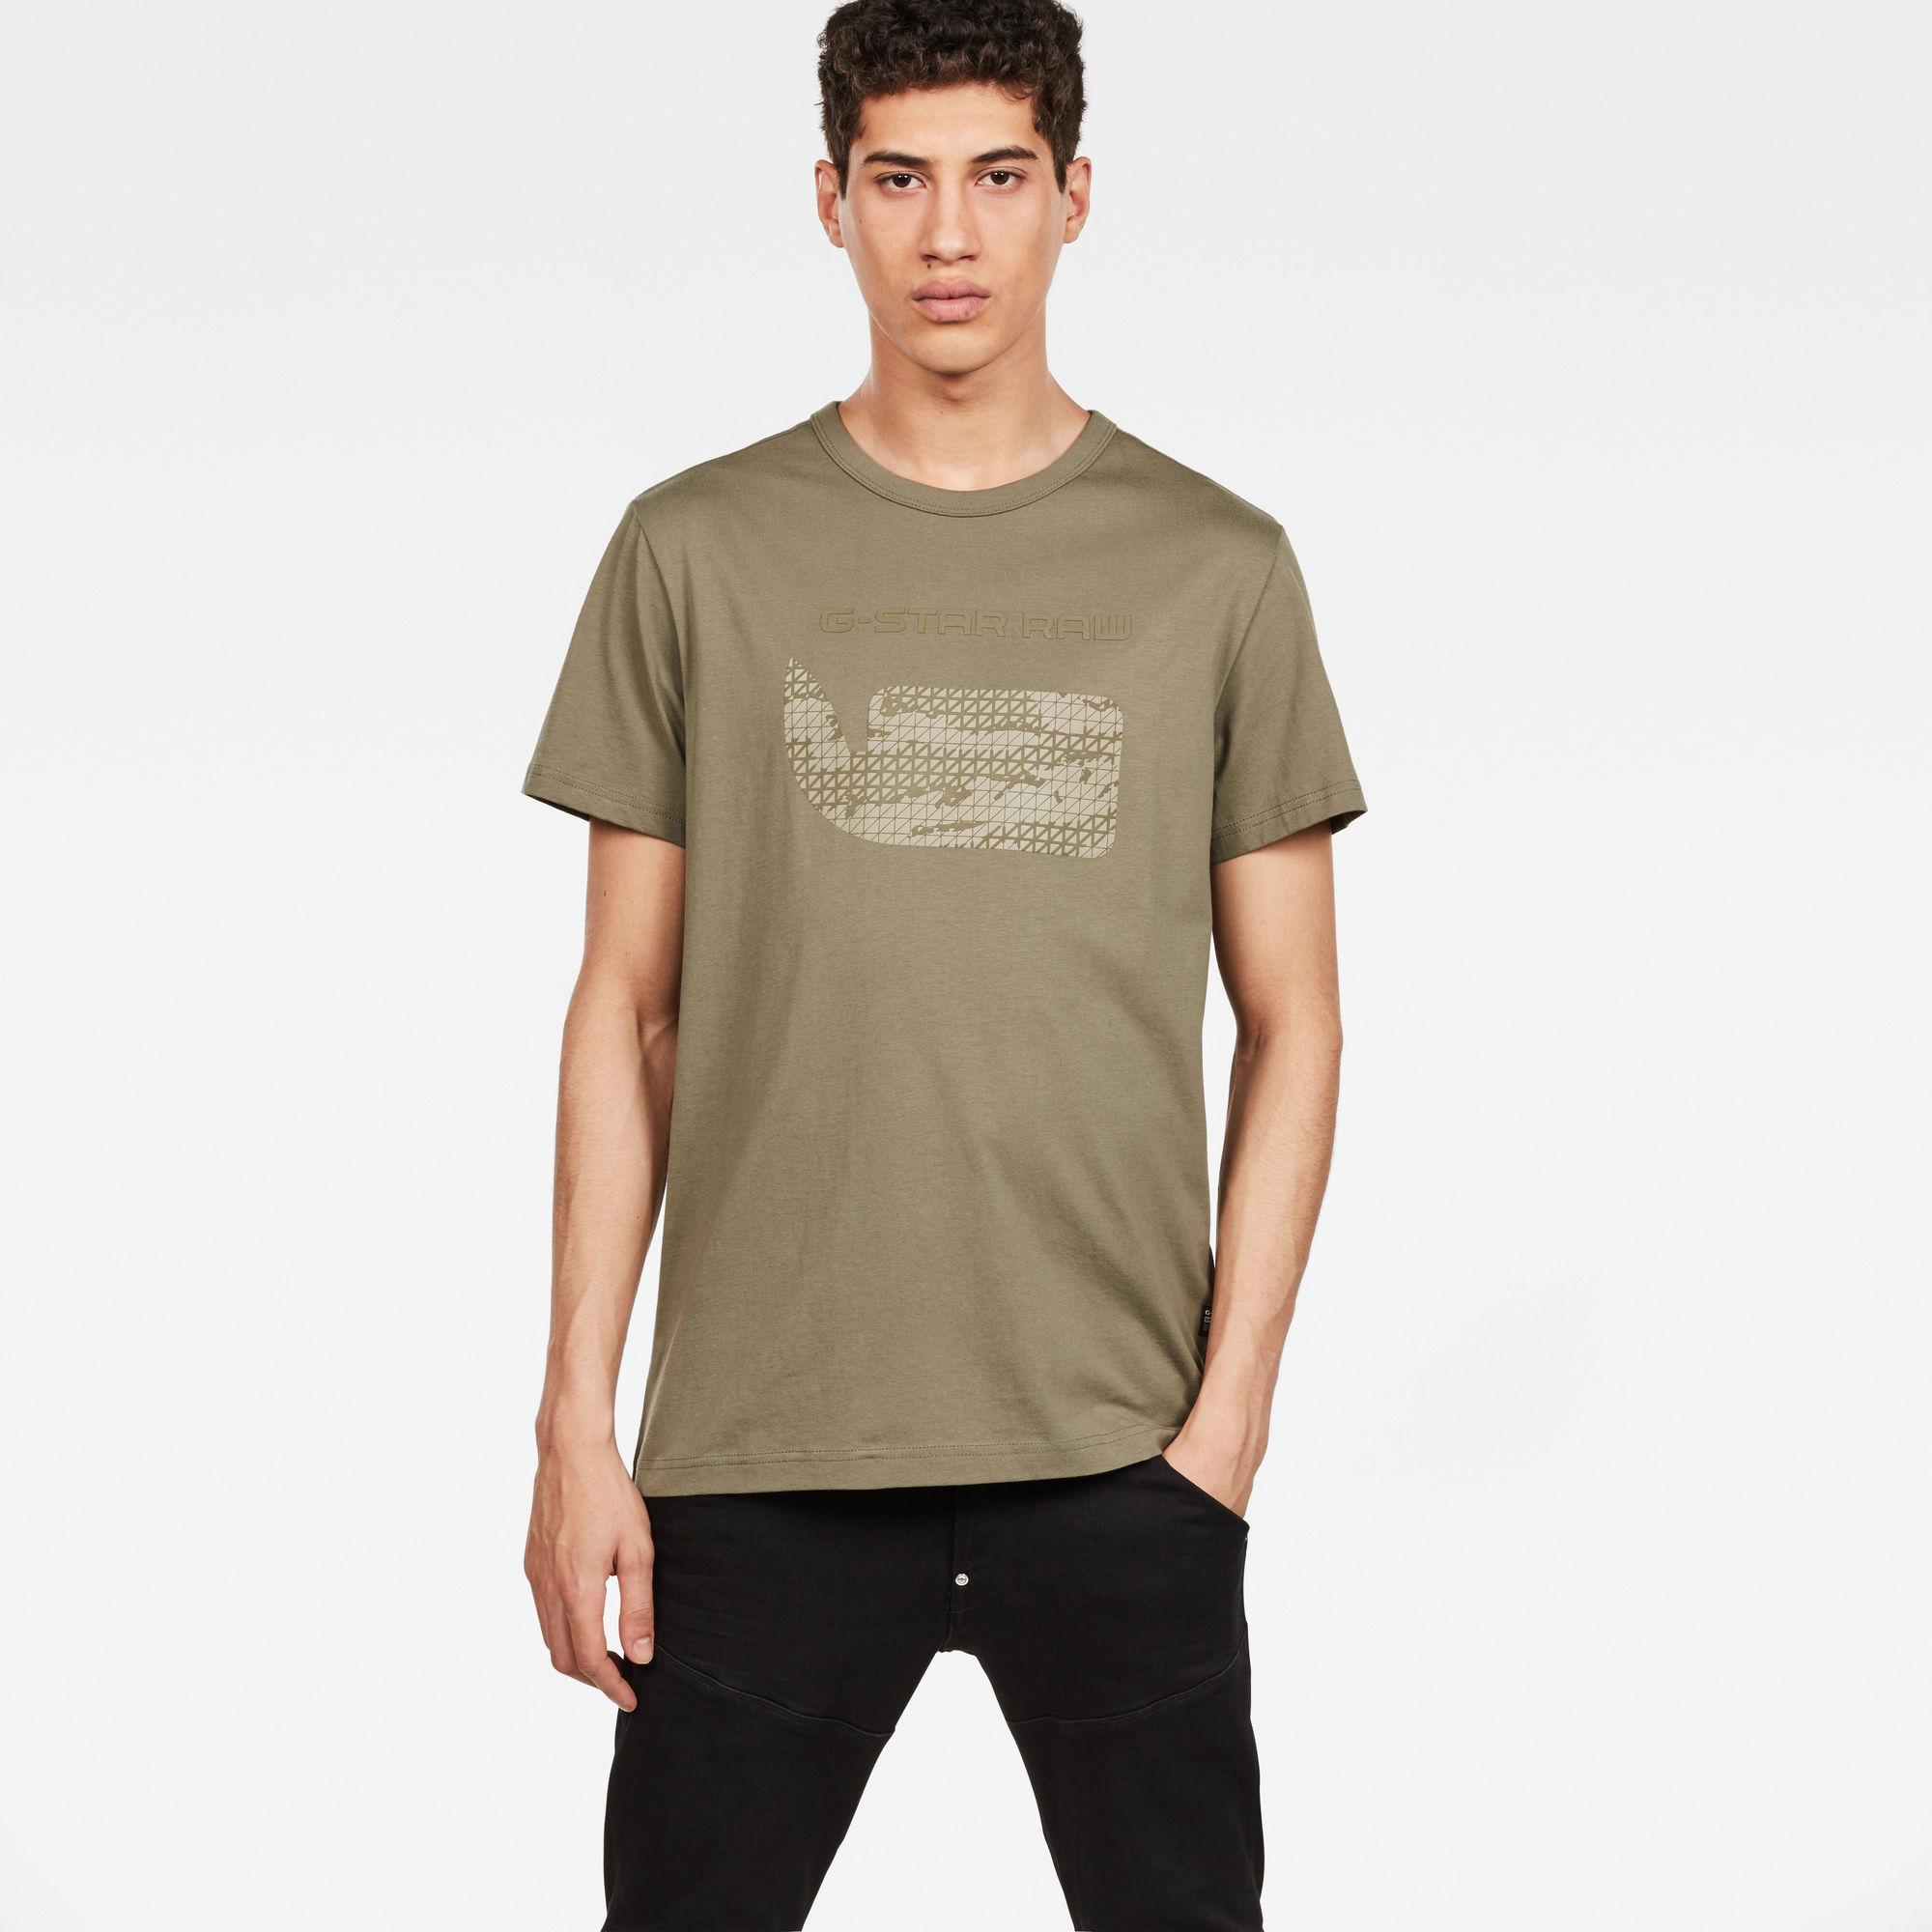 Image of G Star Raw Graphic 07 T-Shirt